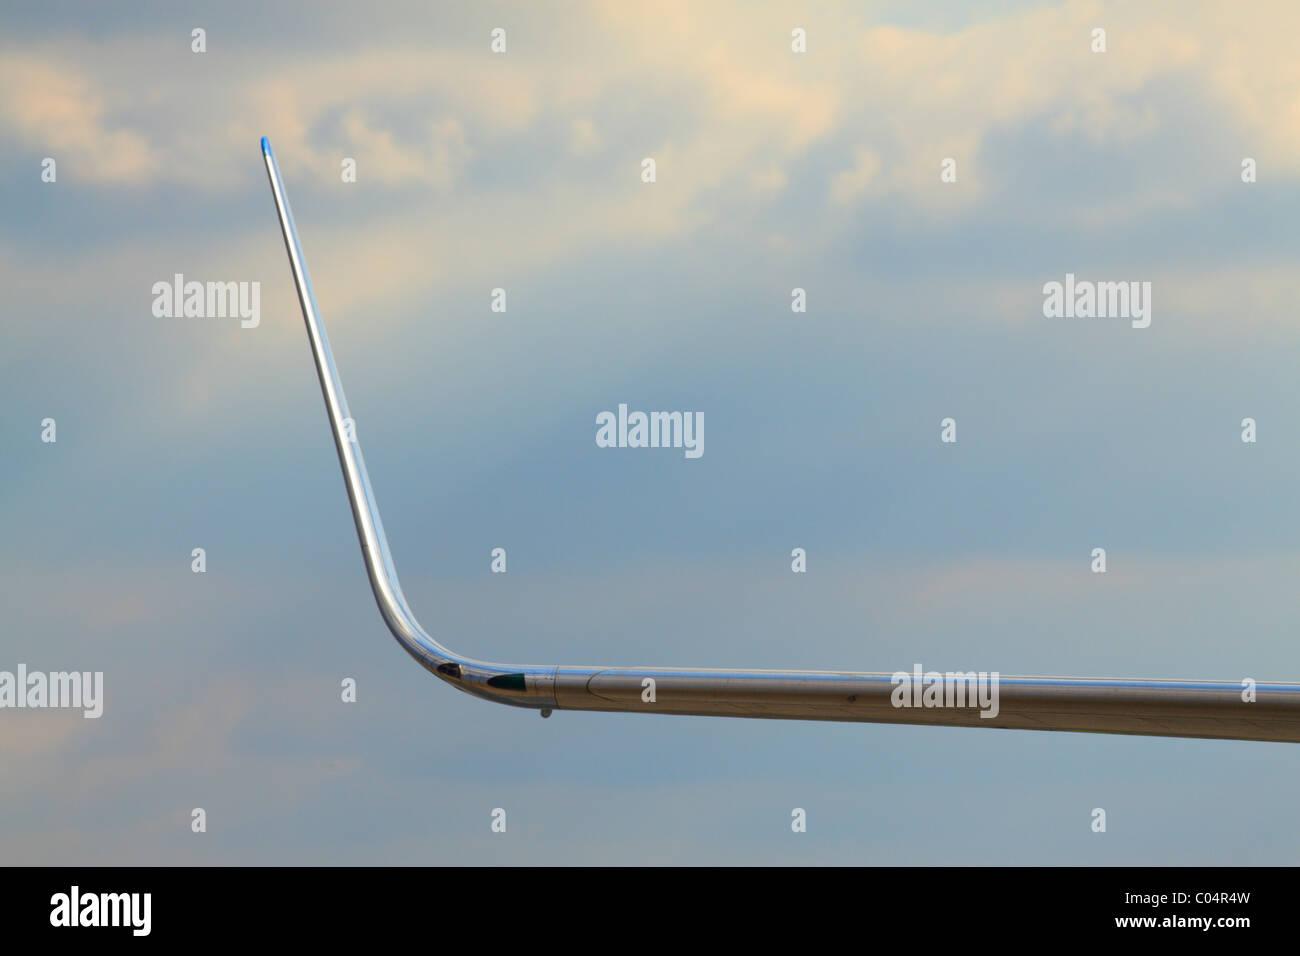 boeing 737  winglet - Stock Image